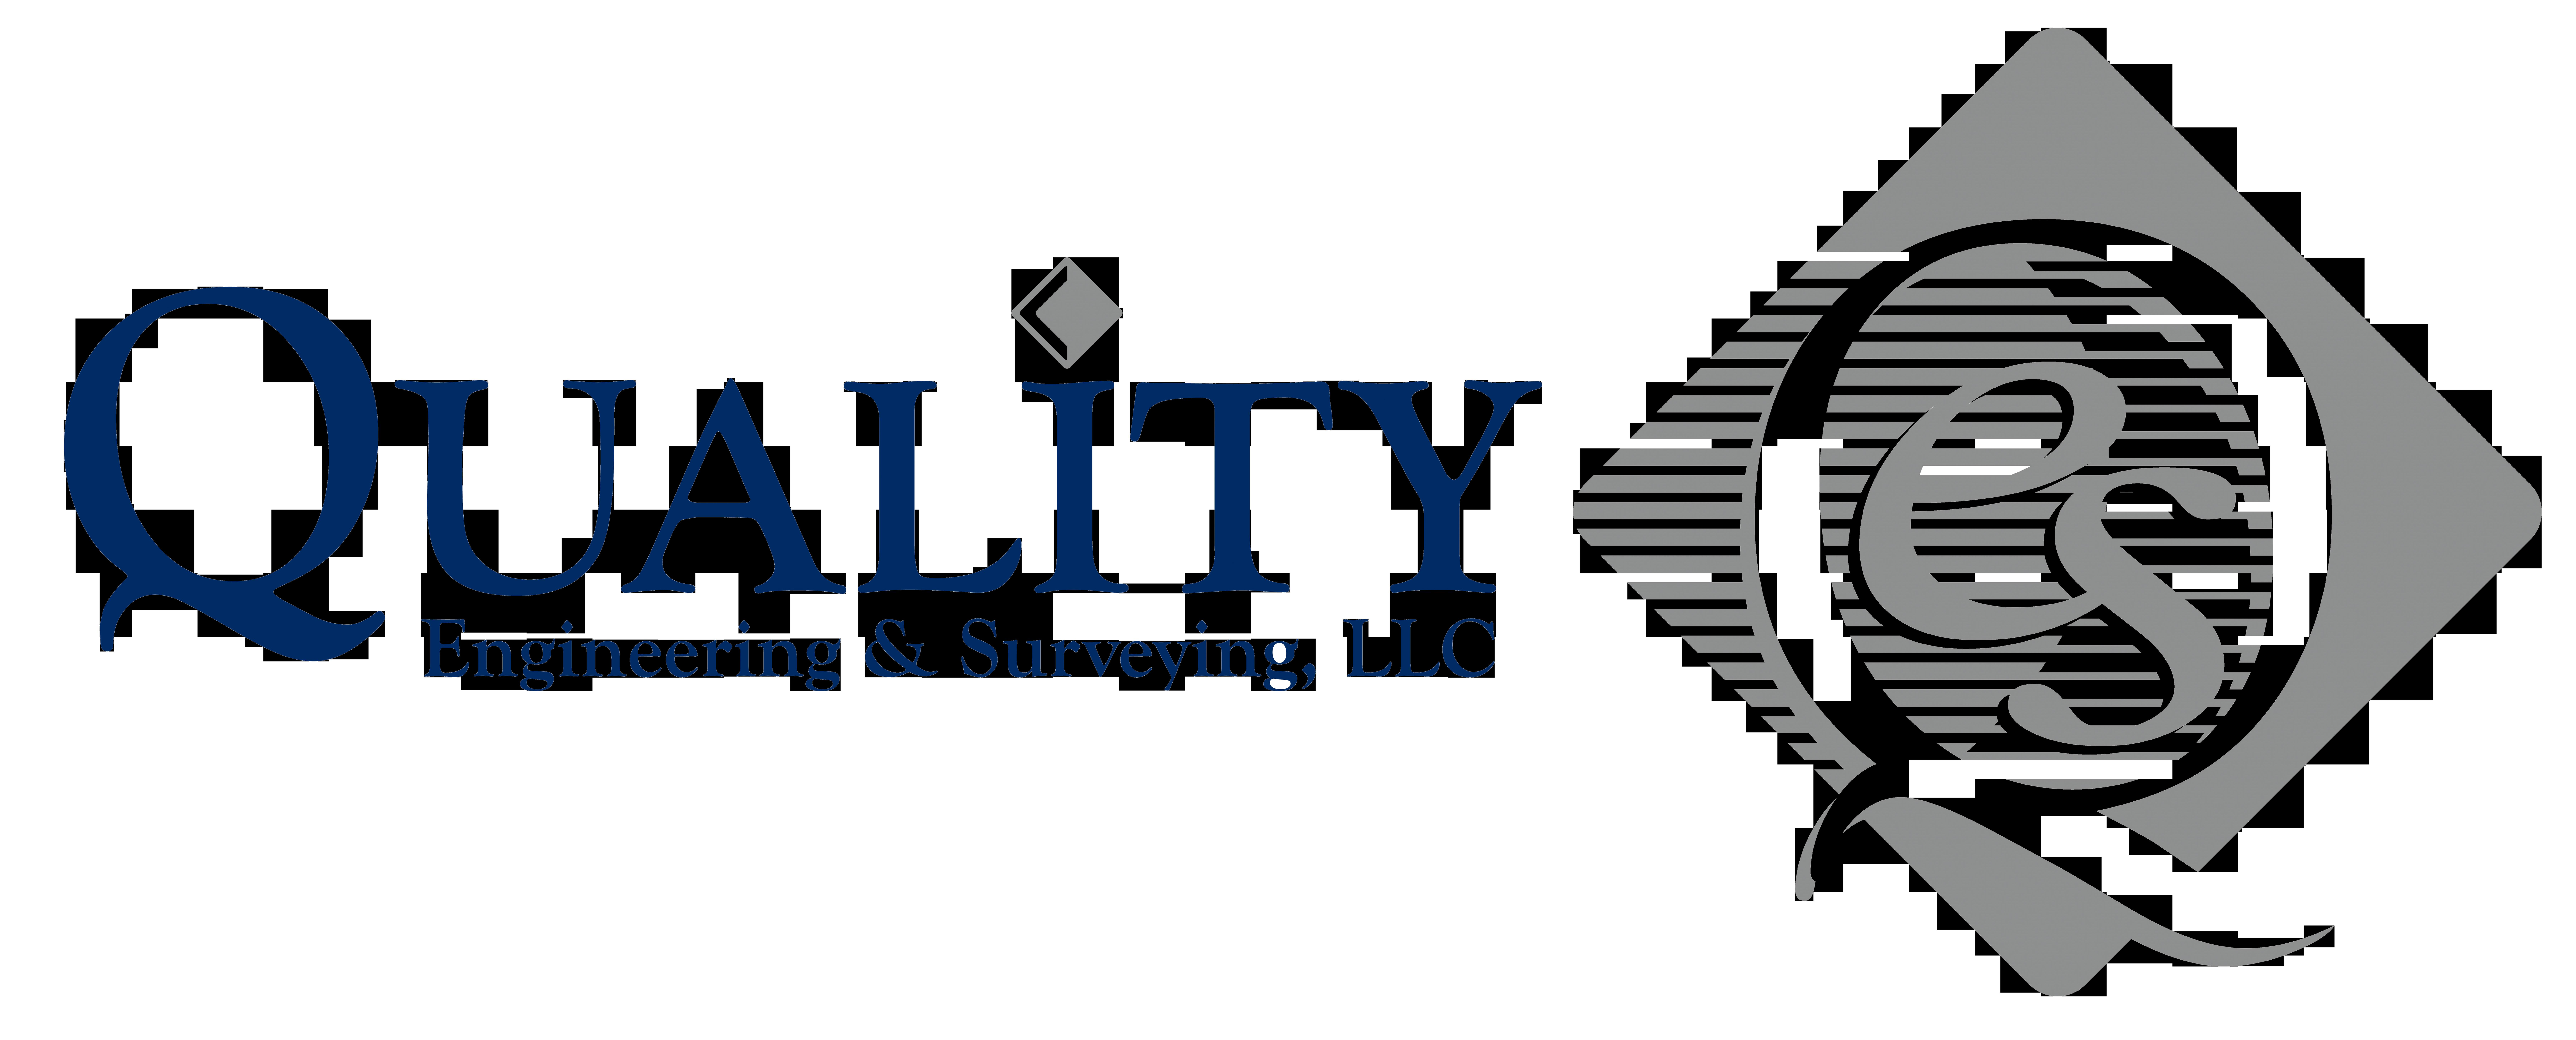 Quality Engineering & Surveying